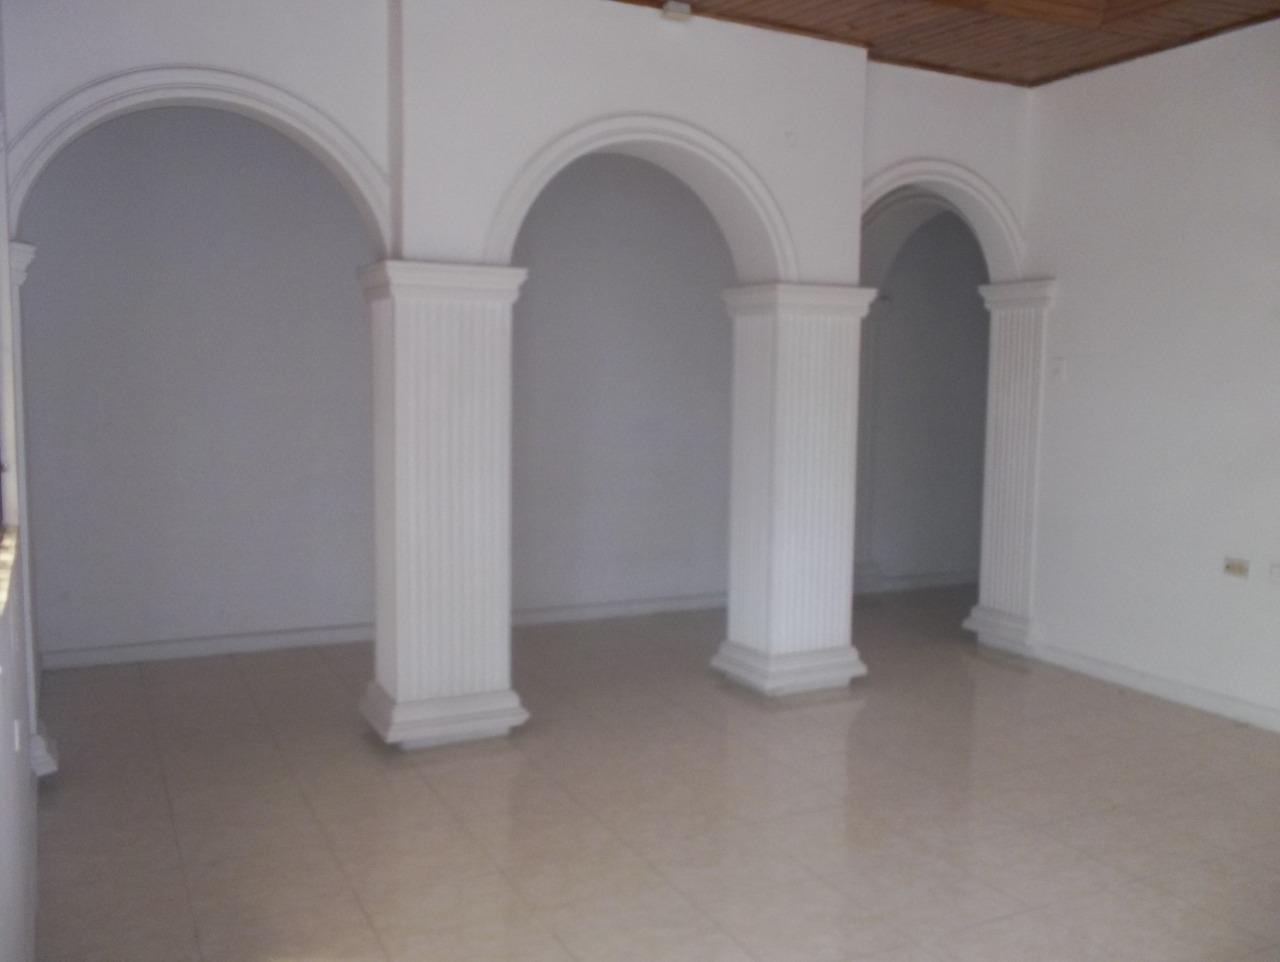 97624 - Casa en arriendo en Centro de Montería - Zona Comercial